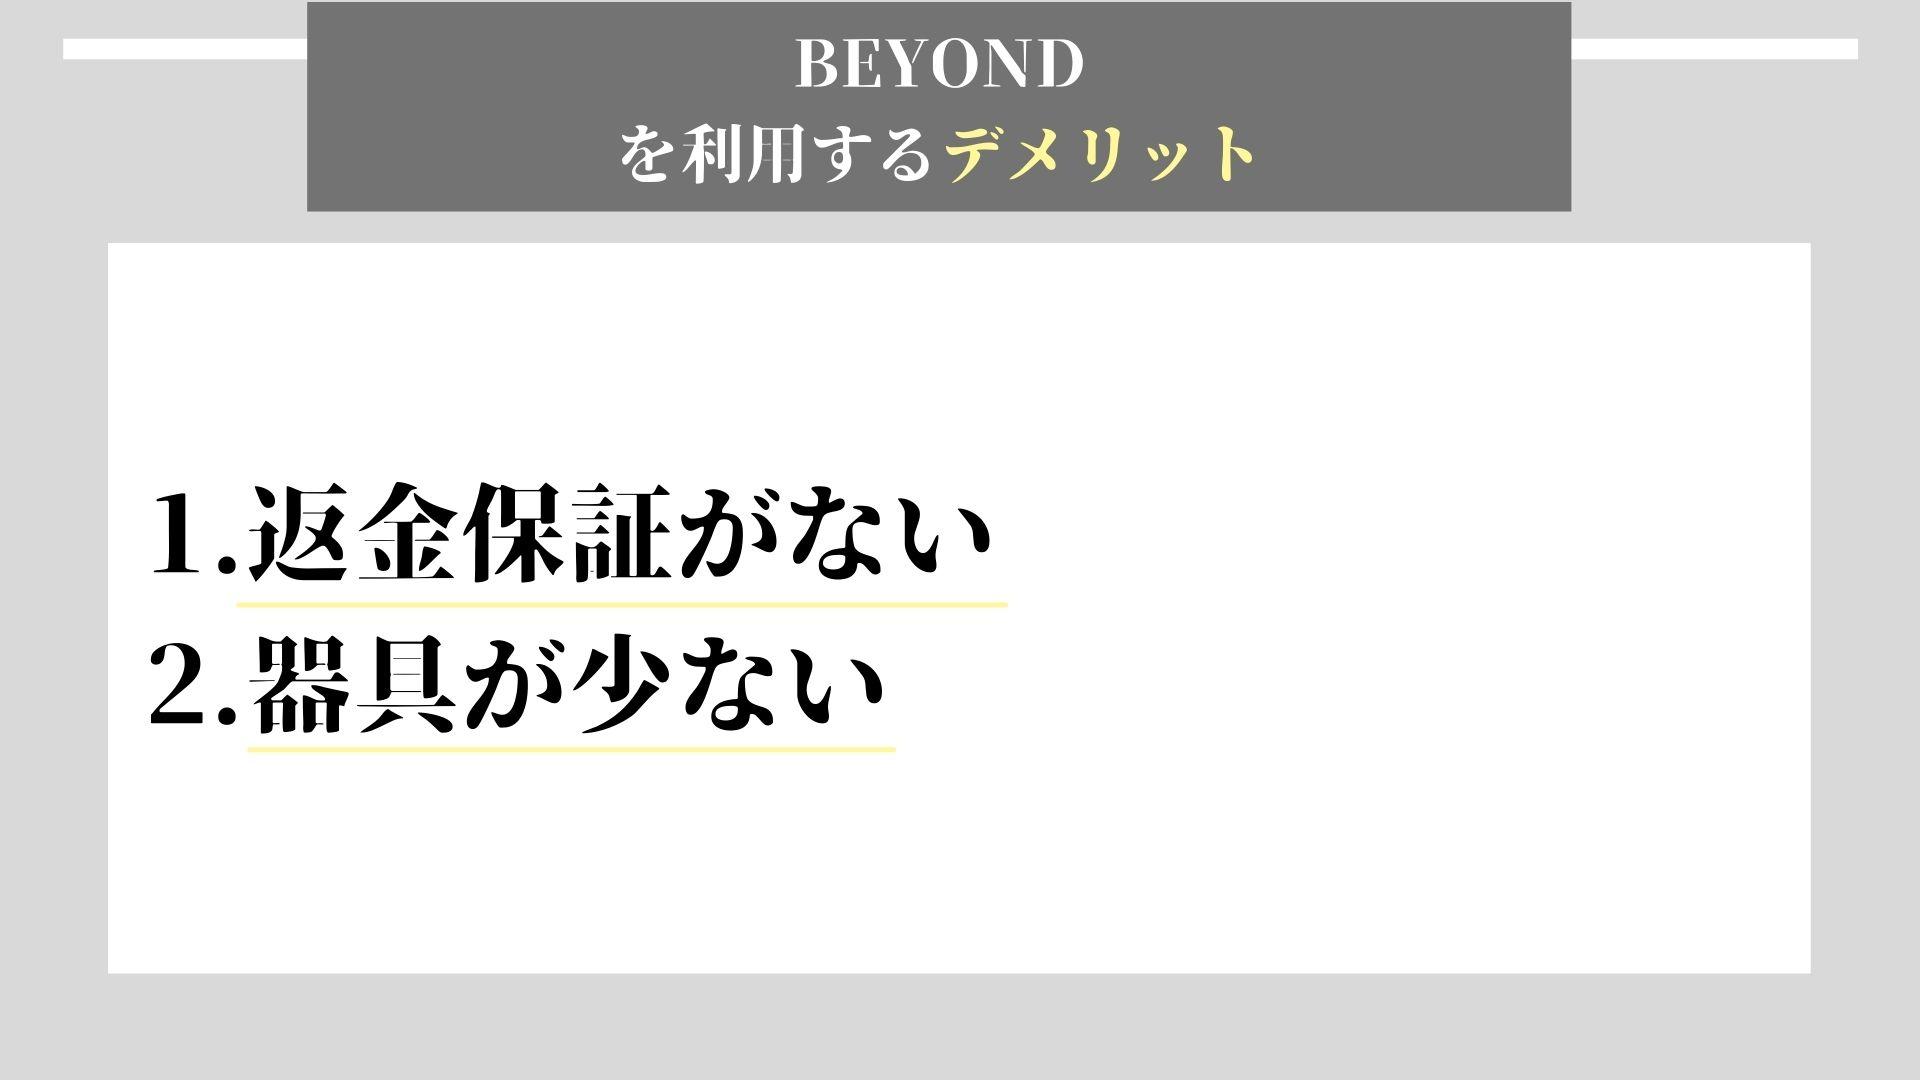 BEYOND デメリット